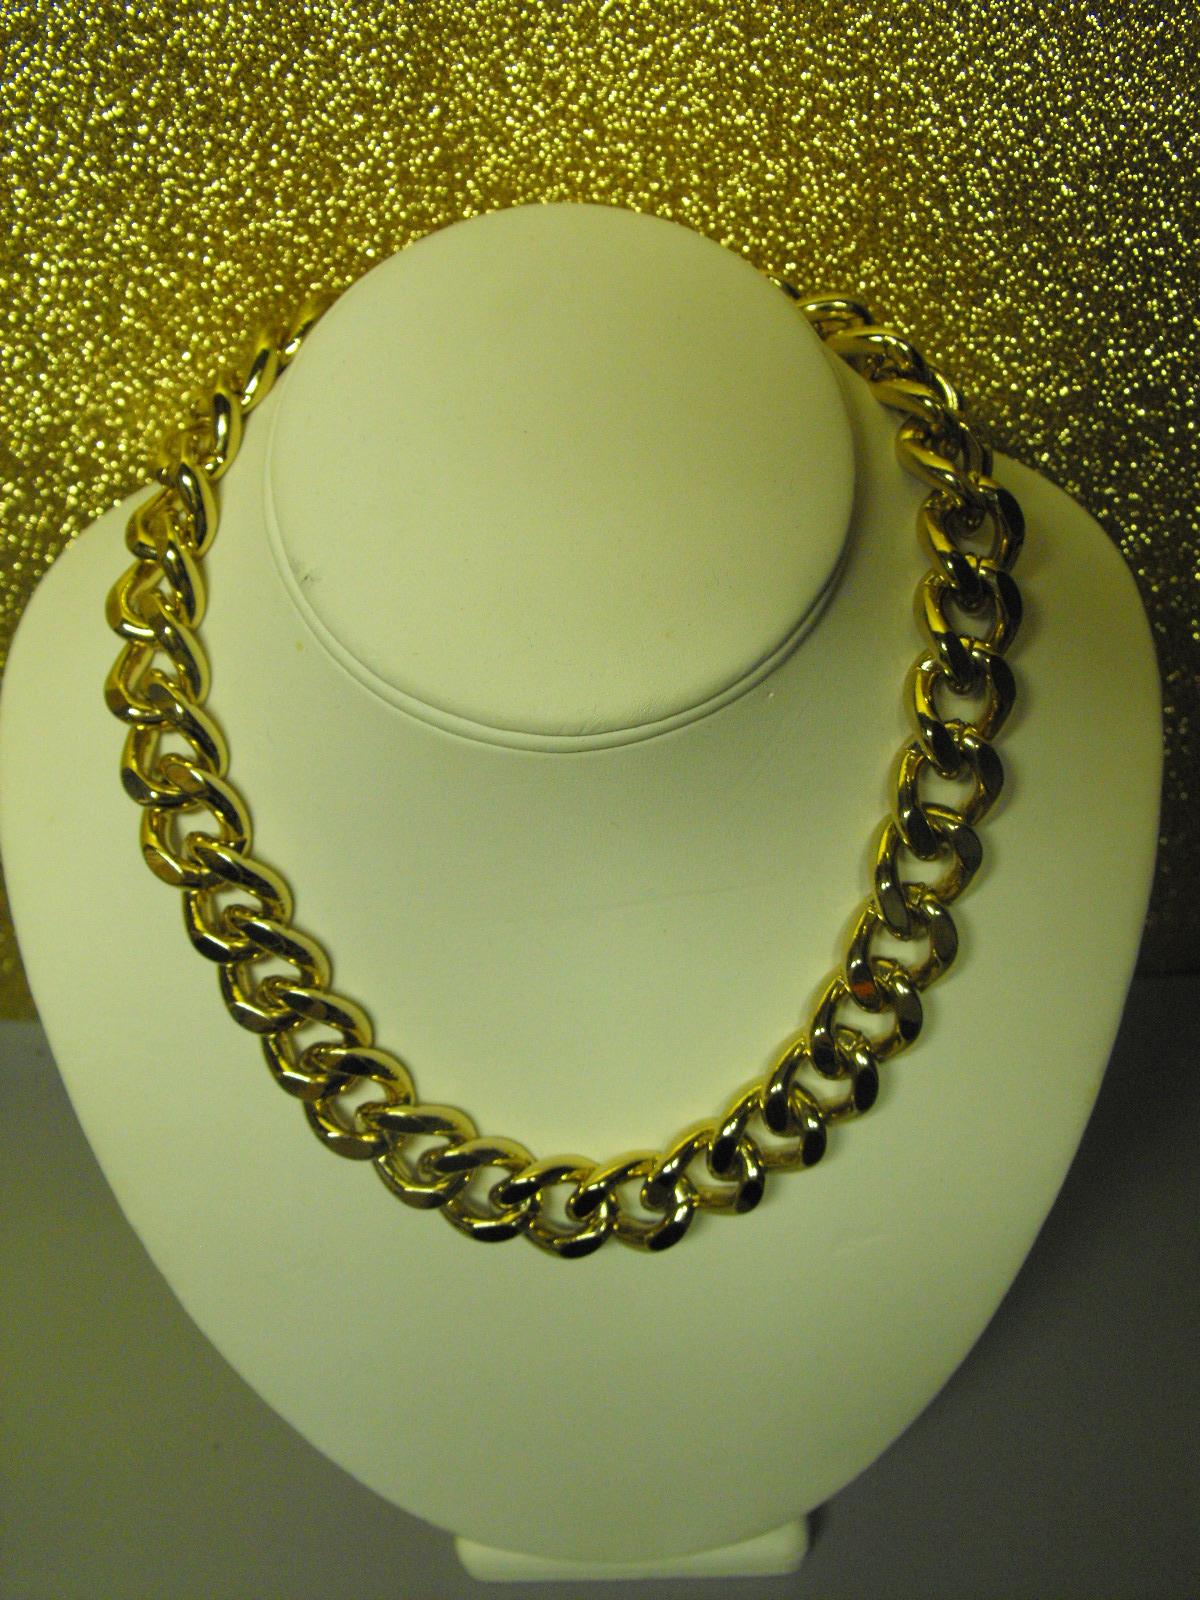 Jones New York Brass Curb Link Necklace Clive S Unique